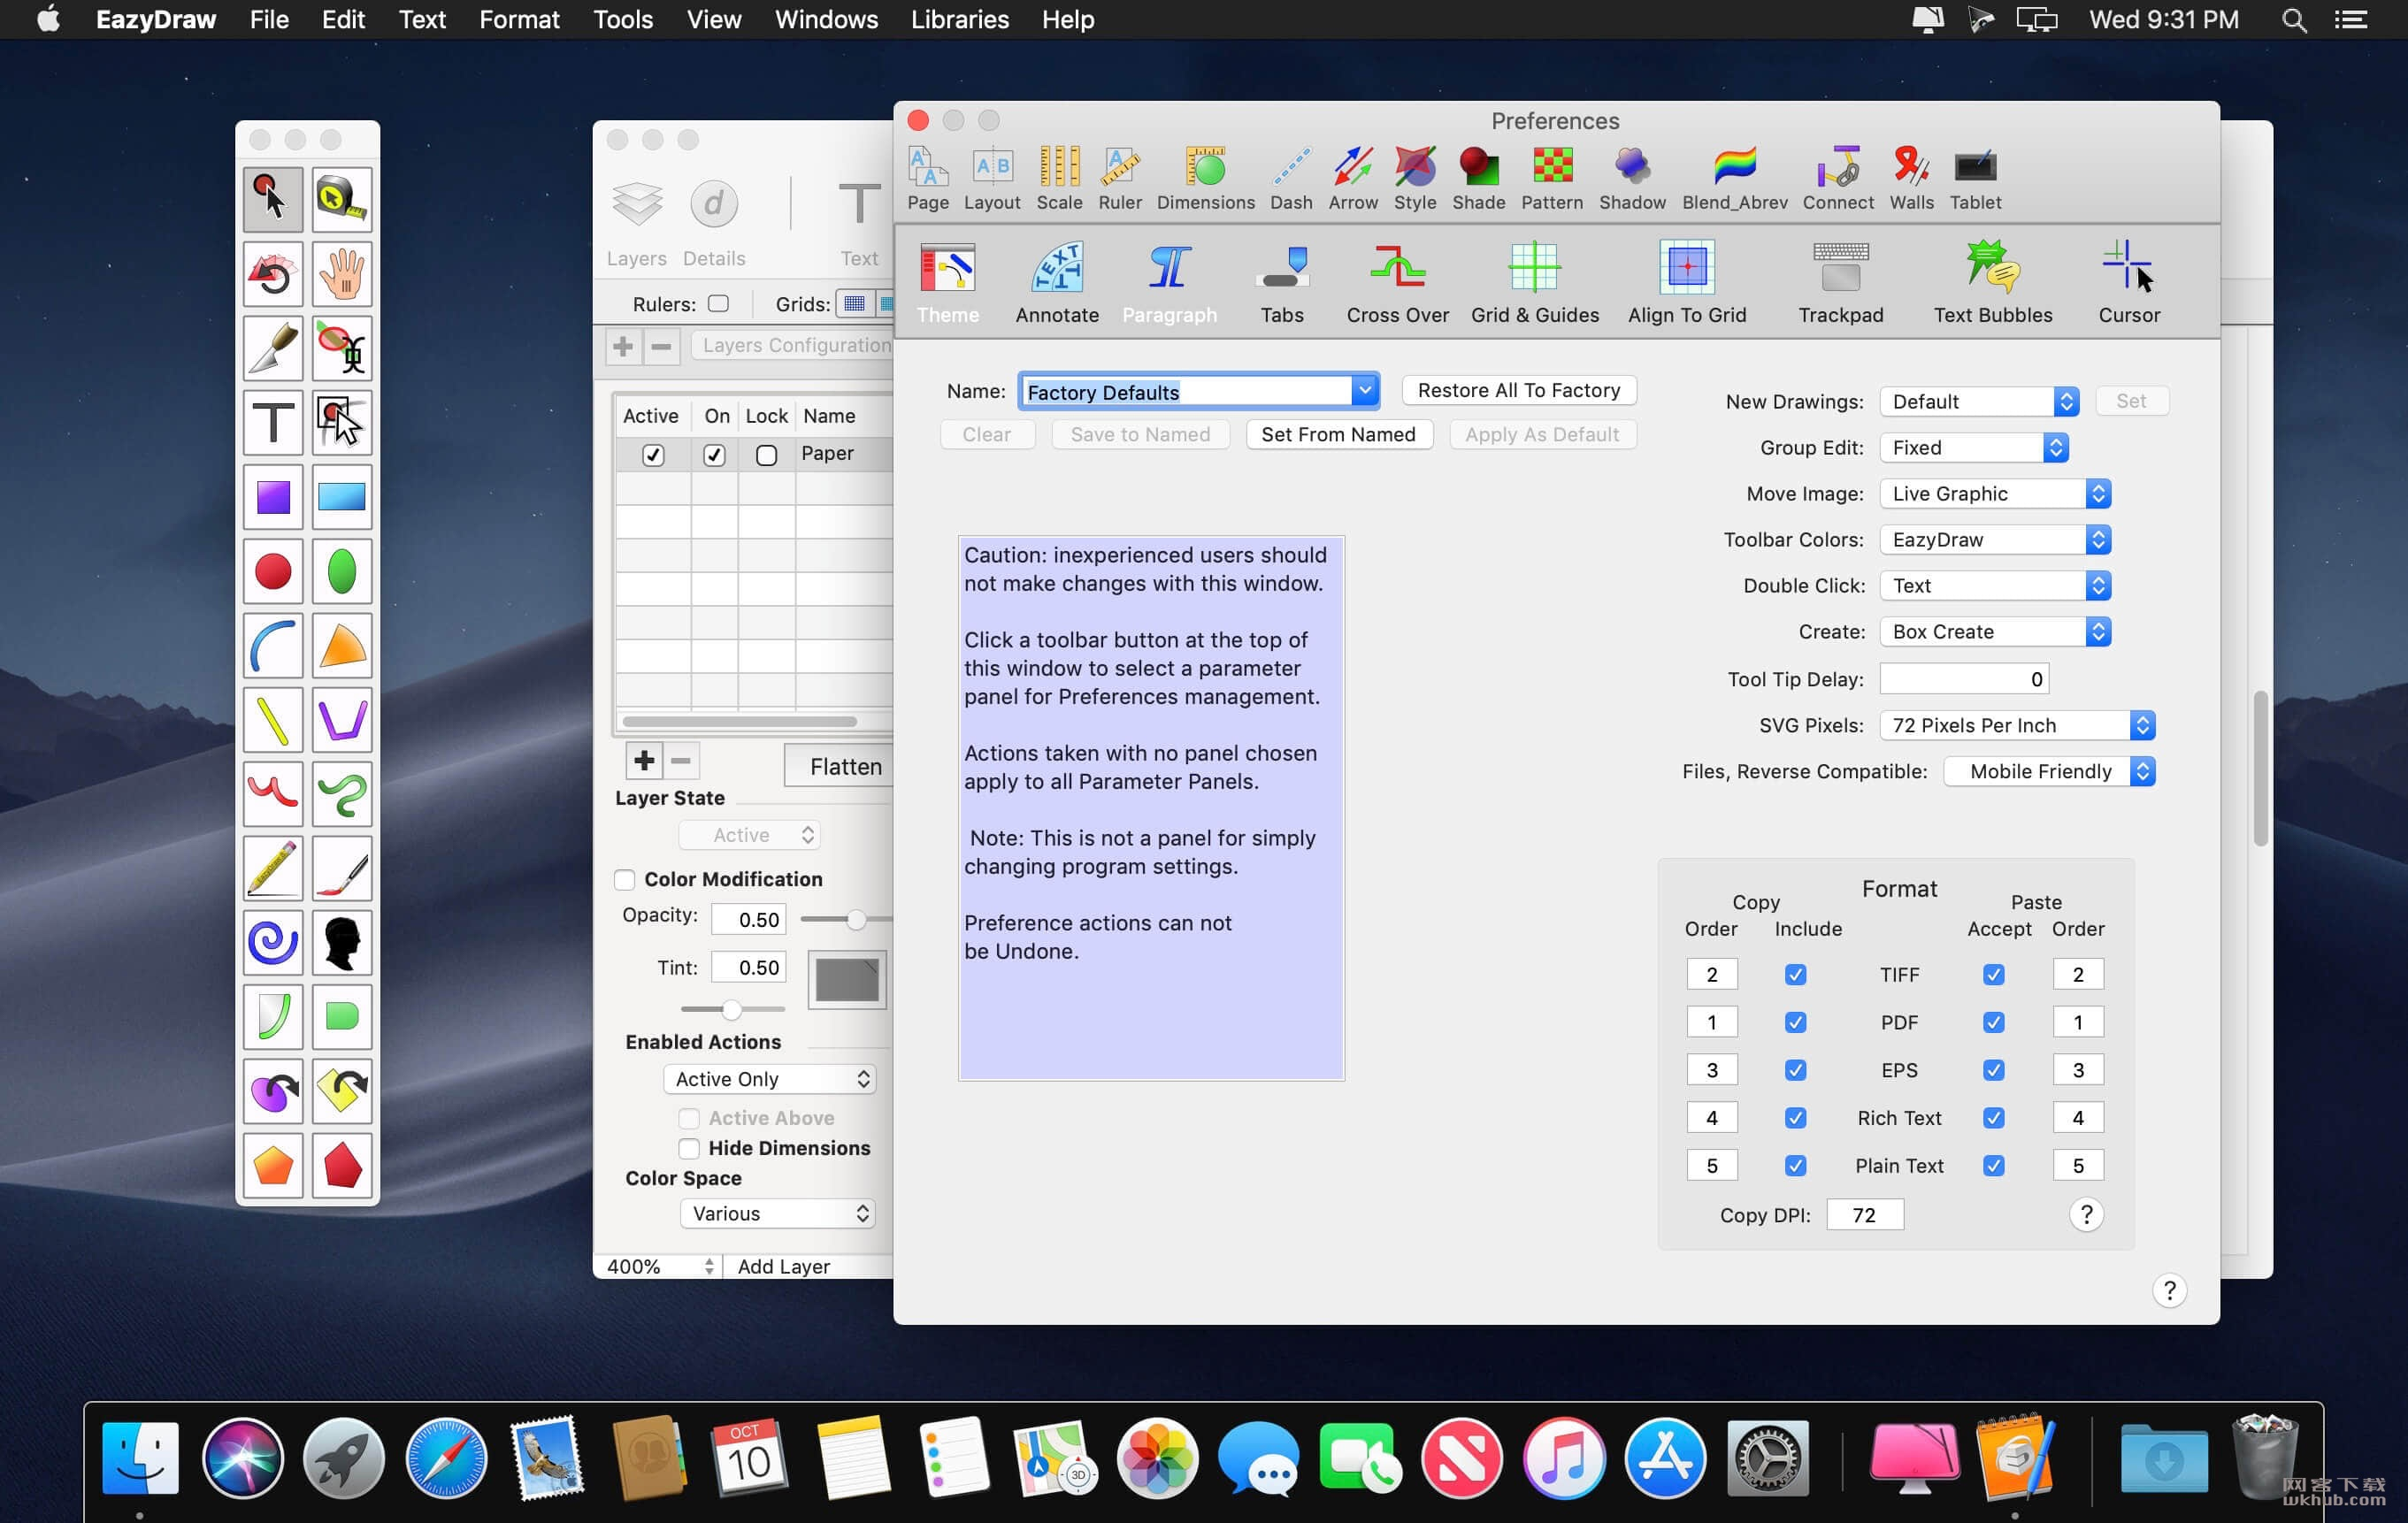 EazyDraw 9.1.6 矢量绘图工具